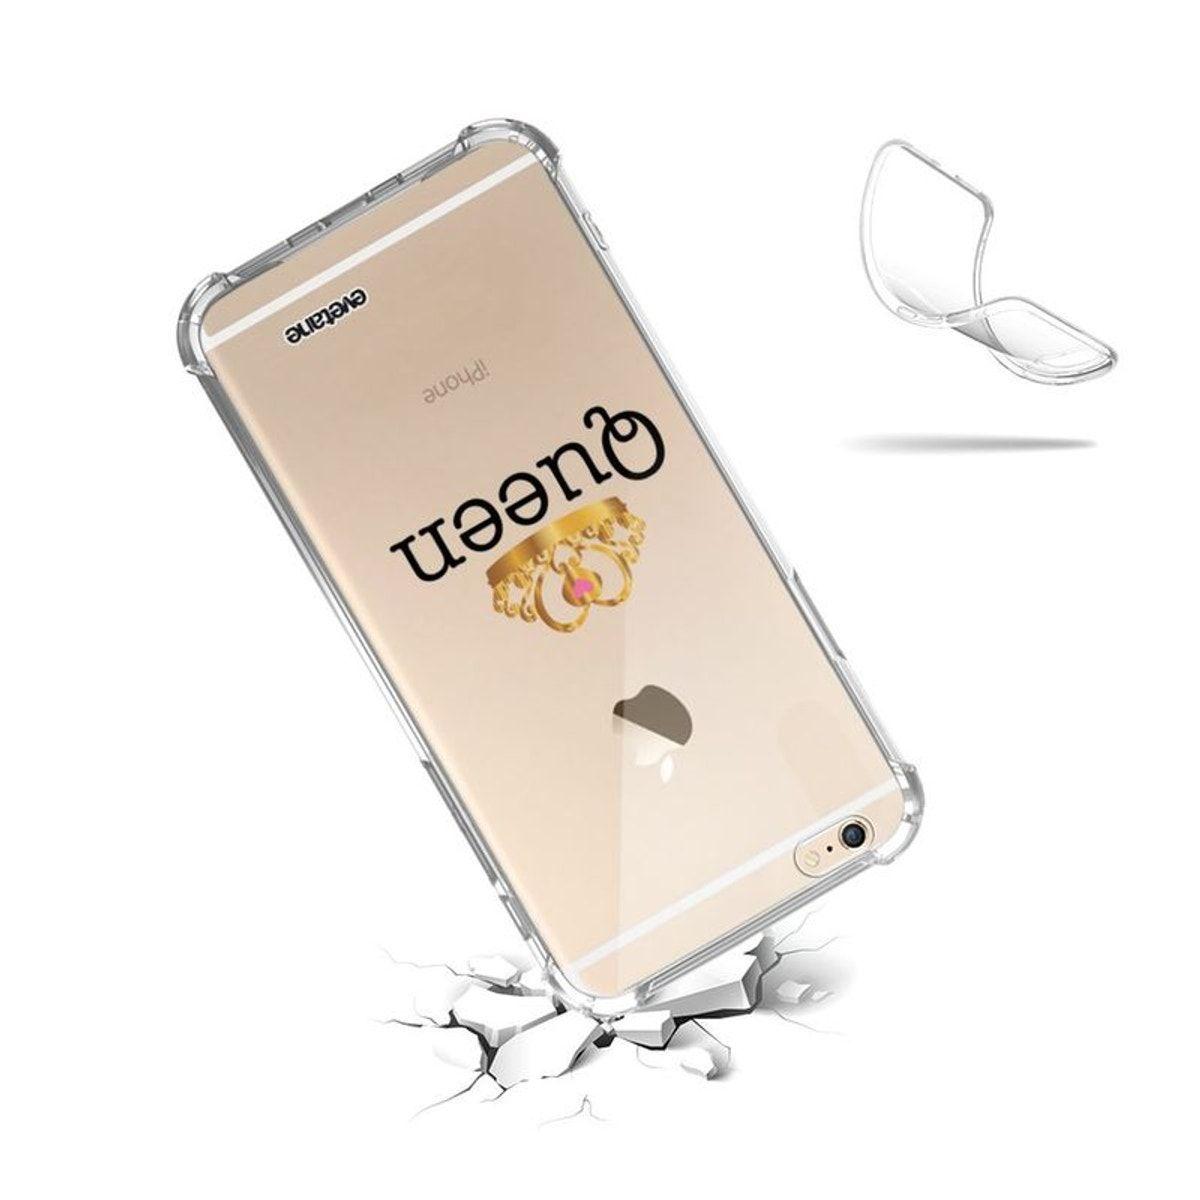 Coque Iphone 6 Iphone 6s Anti-choc Souple Avec Angles Renforcés ...